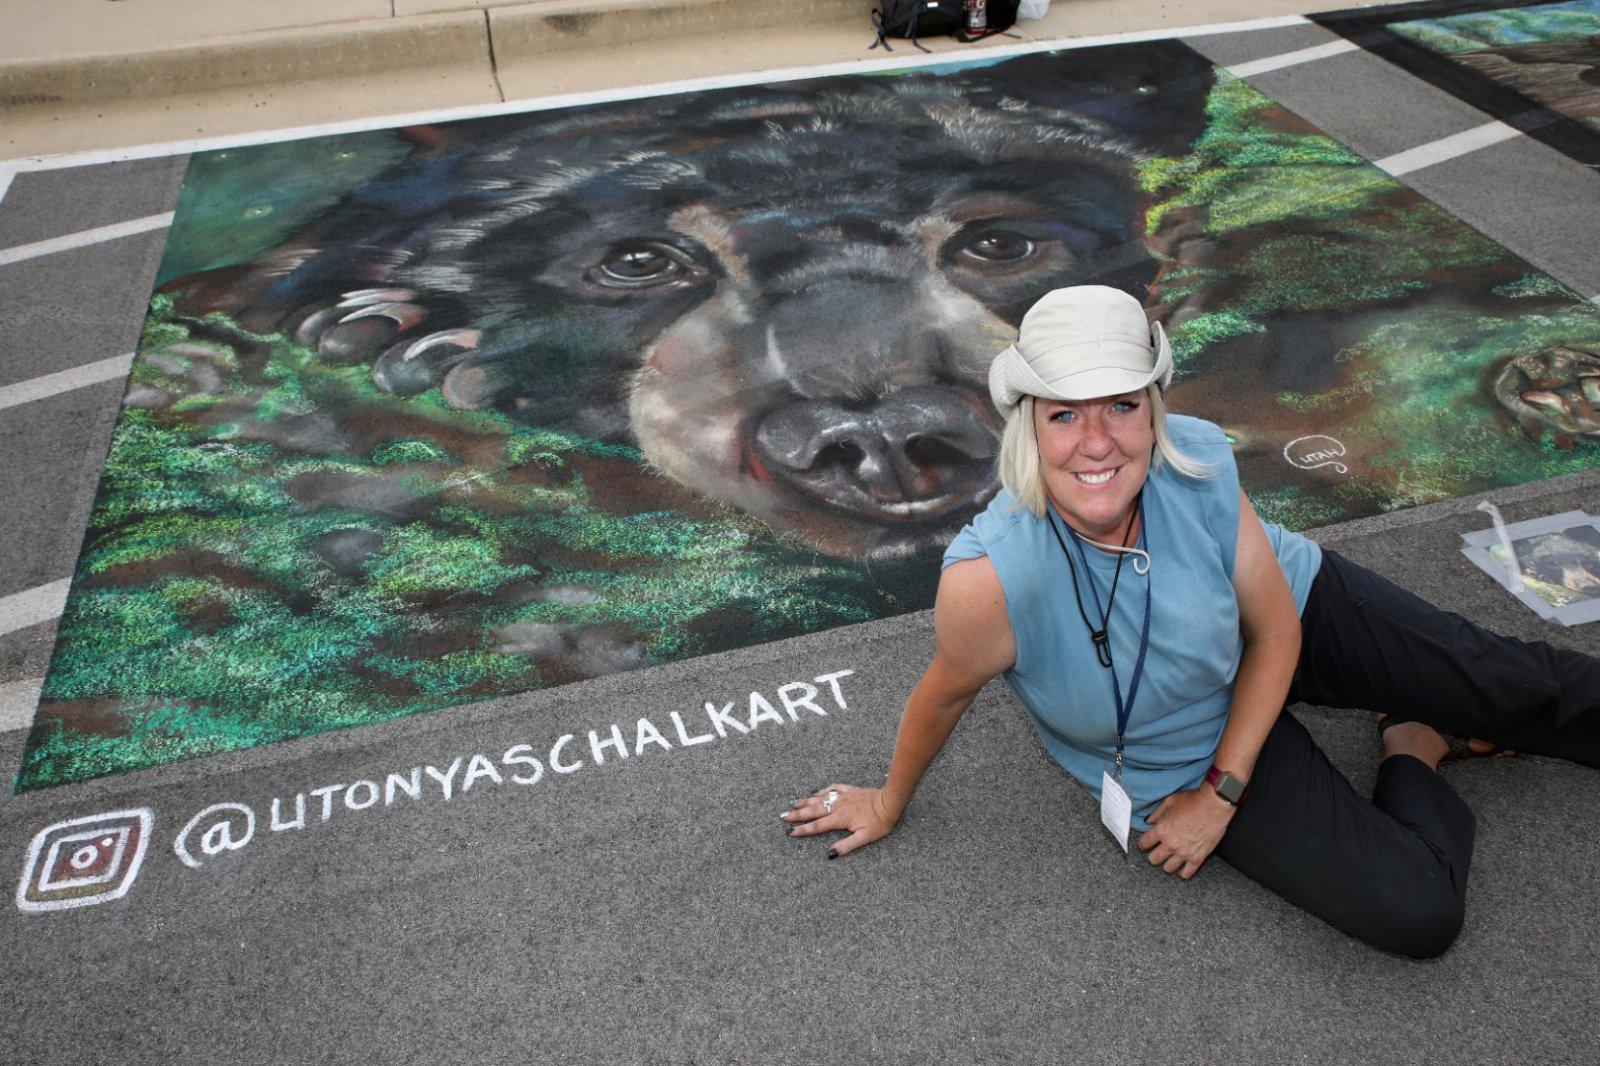 Artist, Tonya Youngberg from West Bountiful, Utah